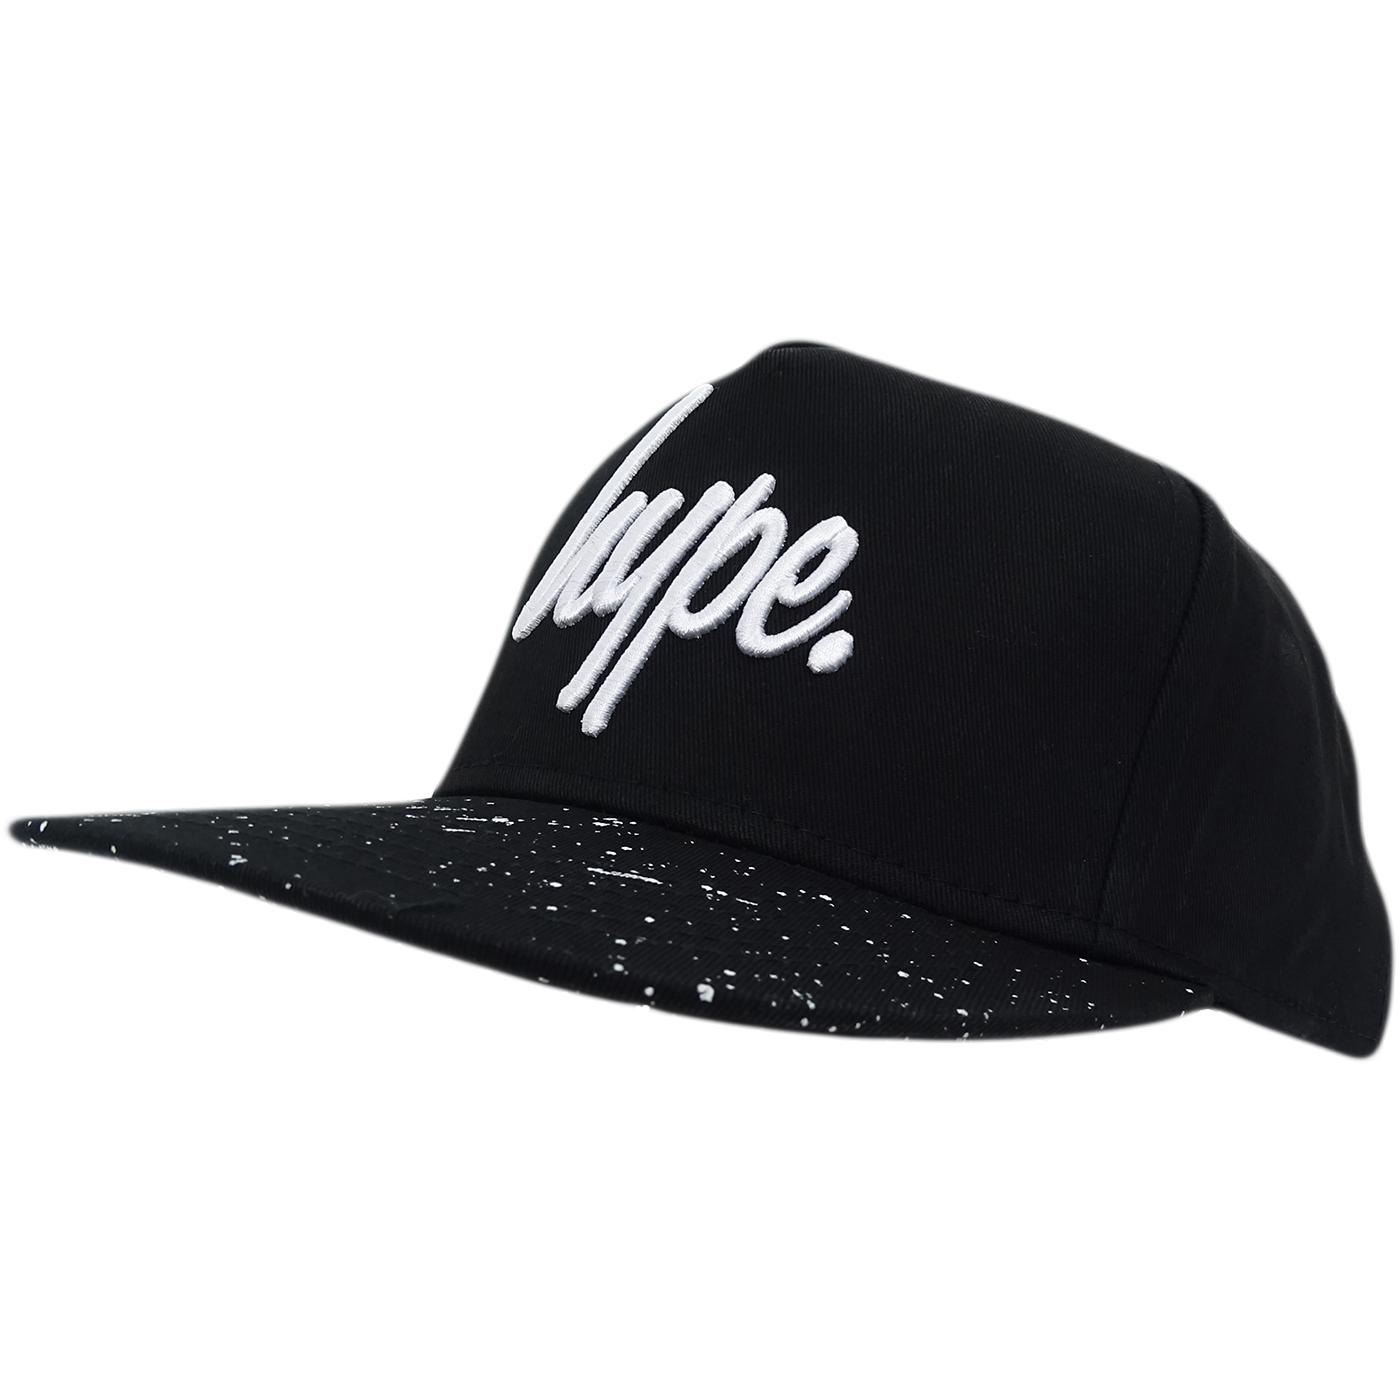 4d6dce56513 Hype Speckled Peack Snapback Cap   Headwear - Hype Speckle Peak ...